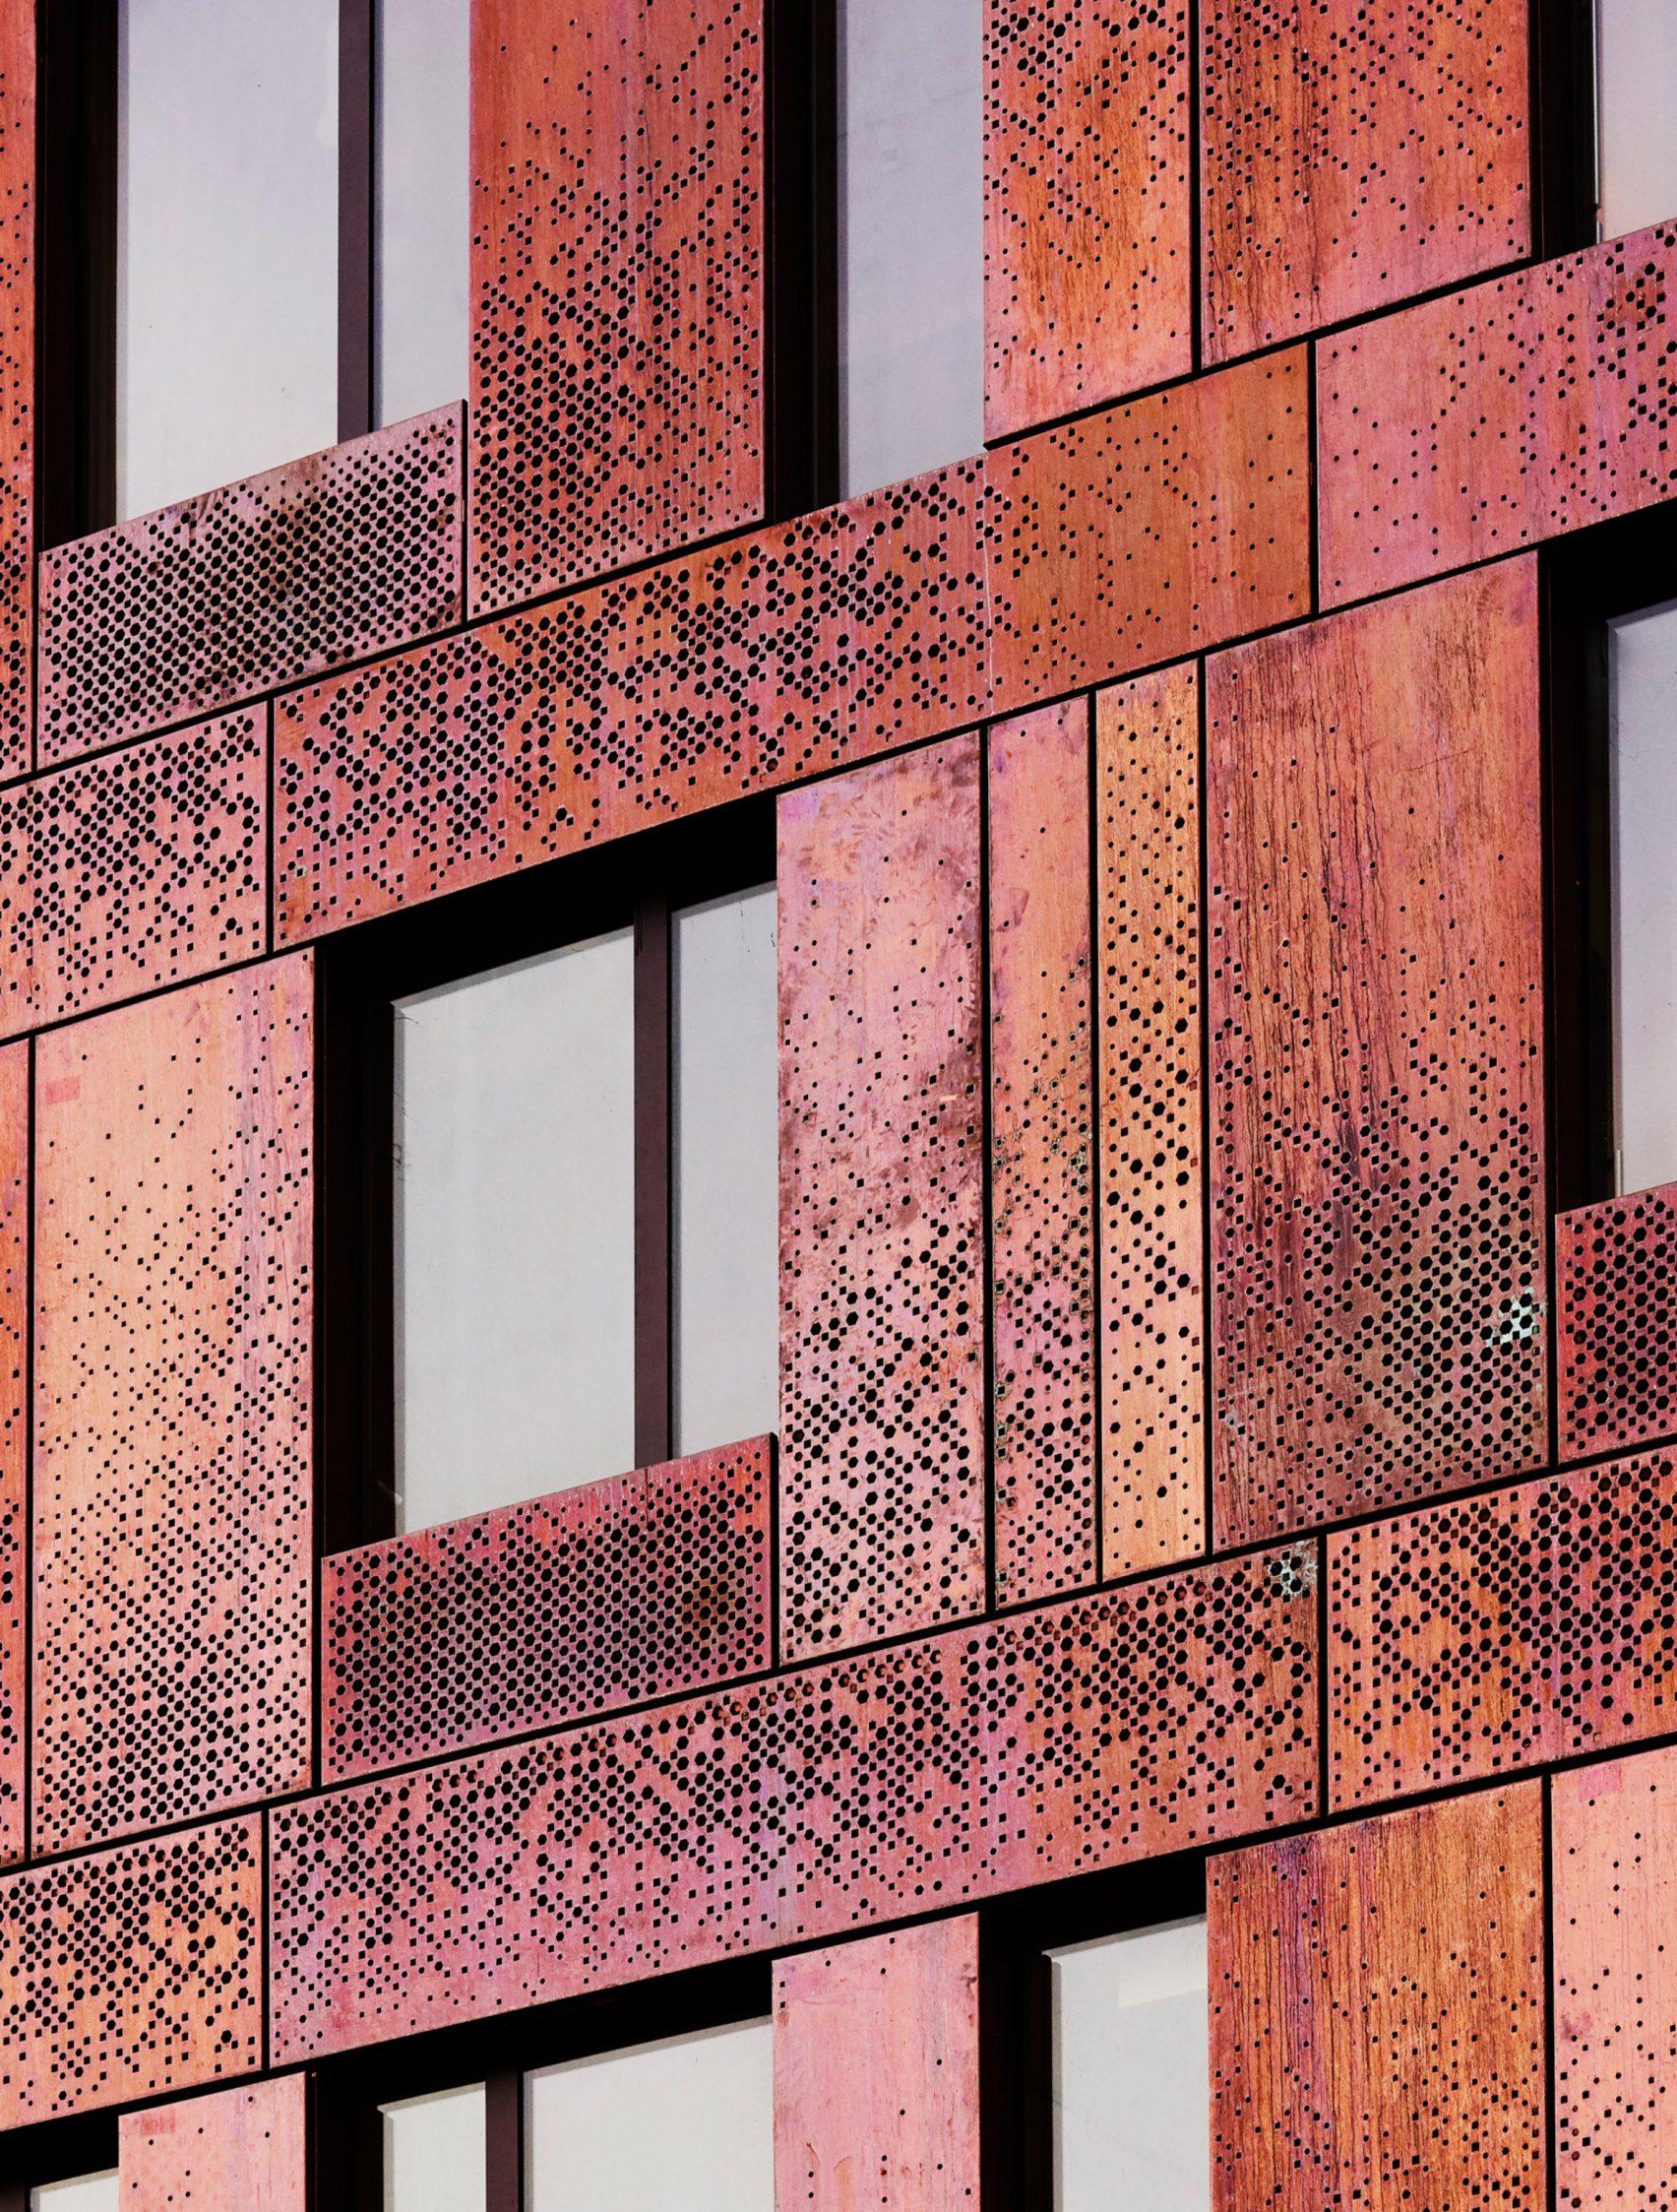 325-kent-shop-architects-brooklyn-noko-05.jpg